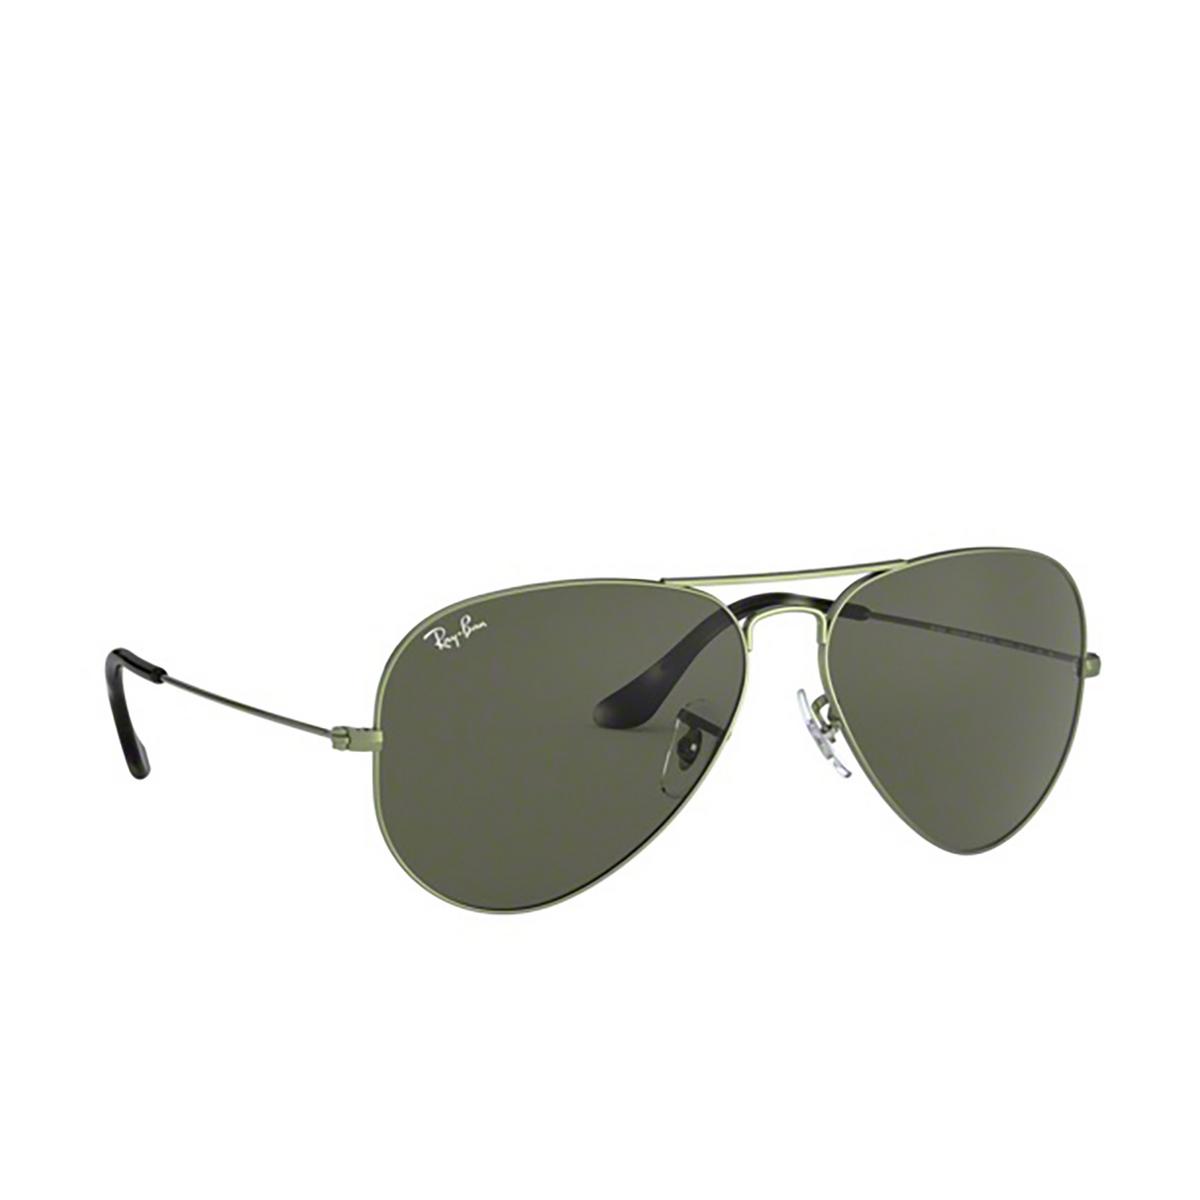 Ray-Ban® Aviator Sunglasses: Aviator Large Metal RB3025 color Sand Transparent Green 919131 - three-quarters view.